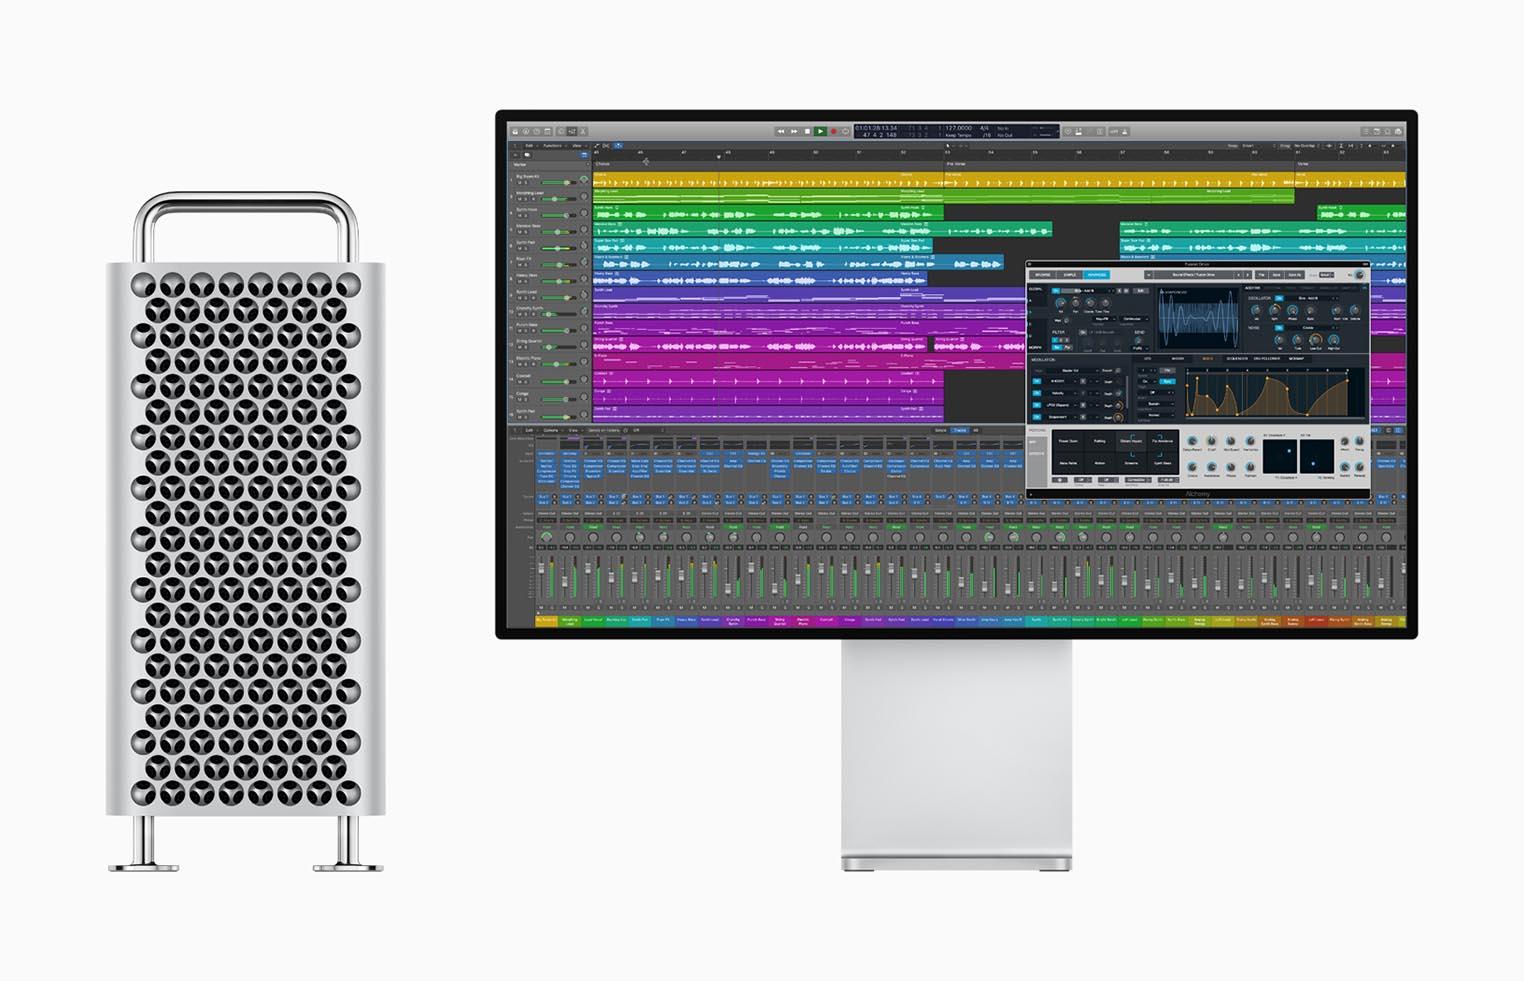 Logic Pro X Mac Pro 2019